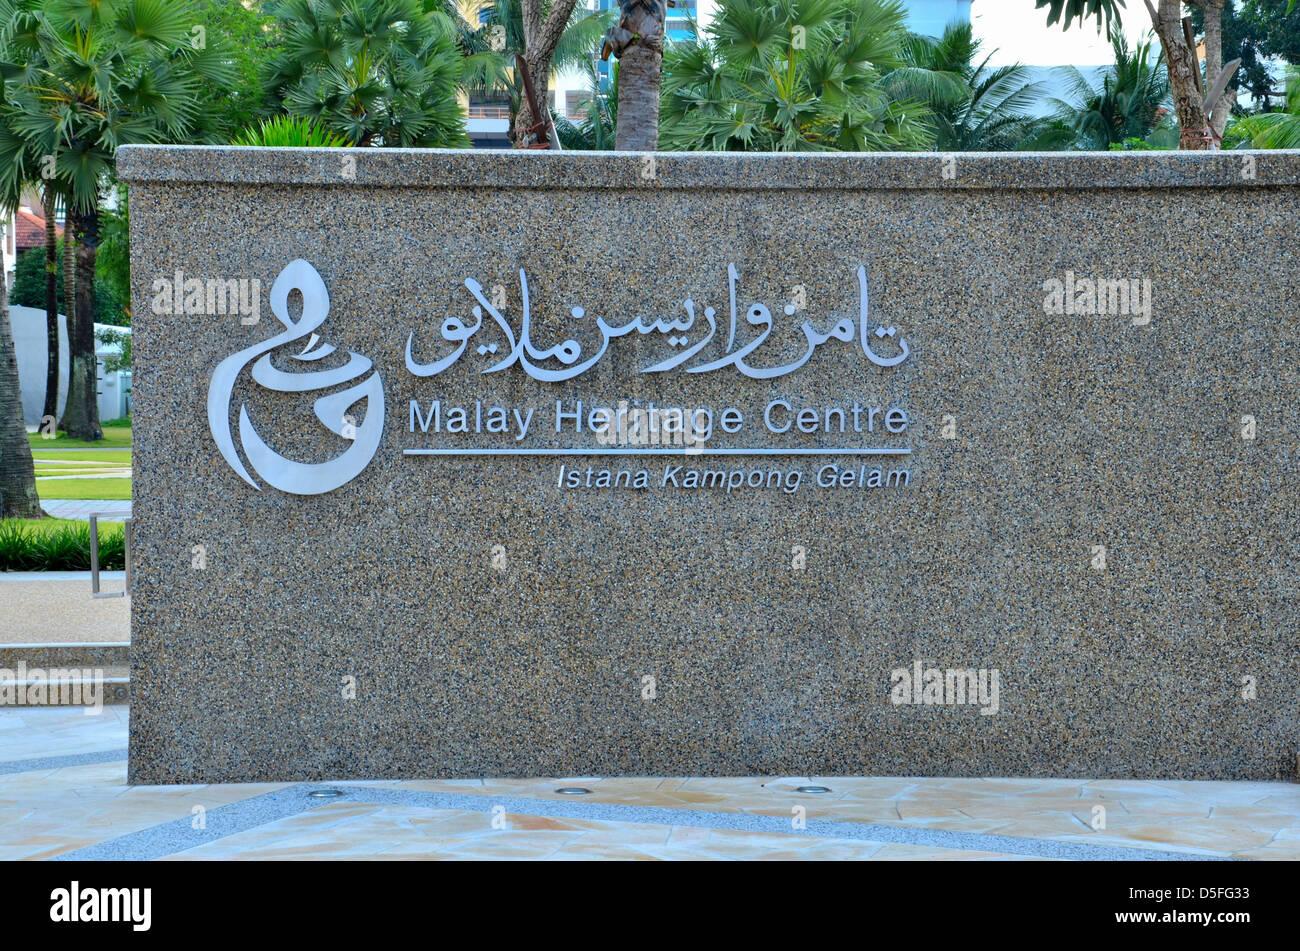 Malay Heritage Centre, Kampong Glam Singapore - Stock Image